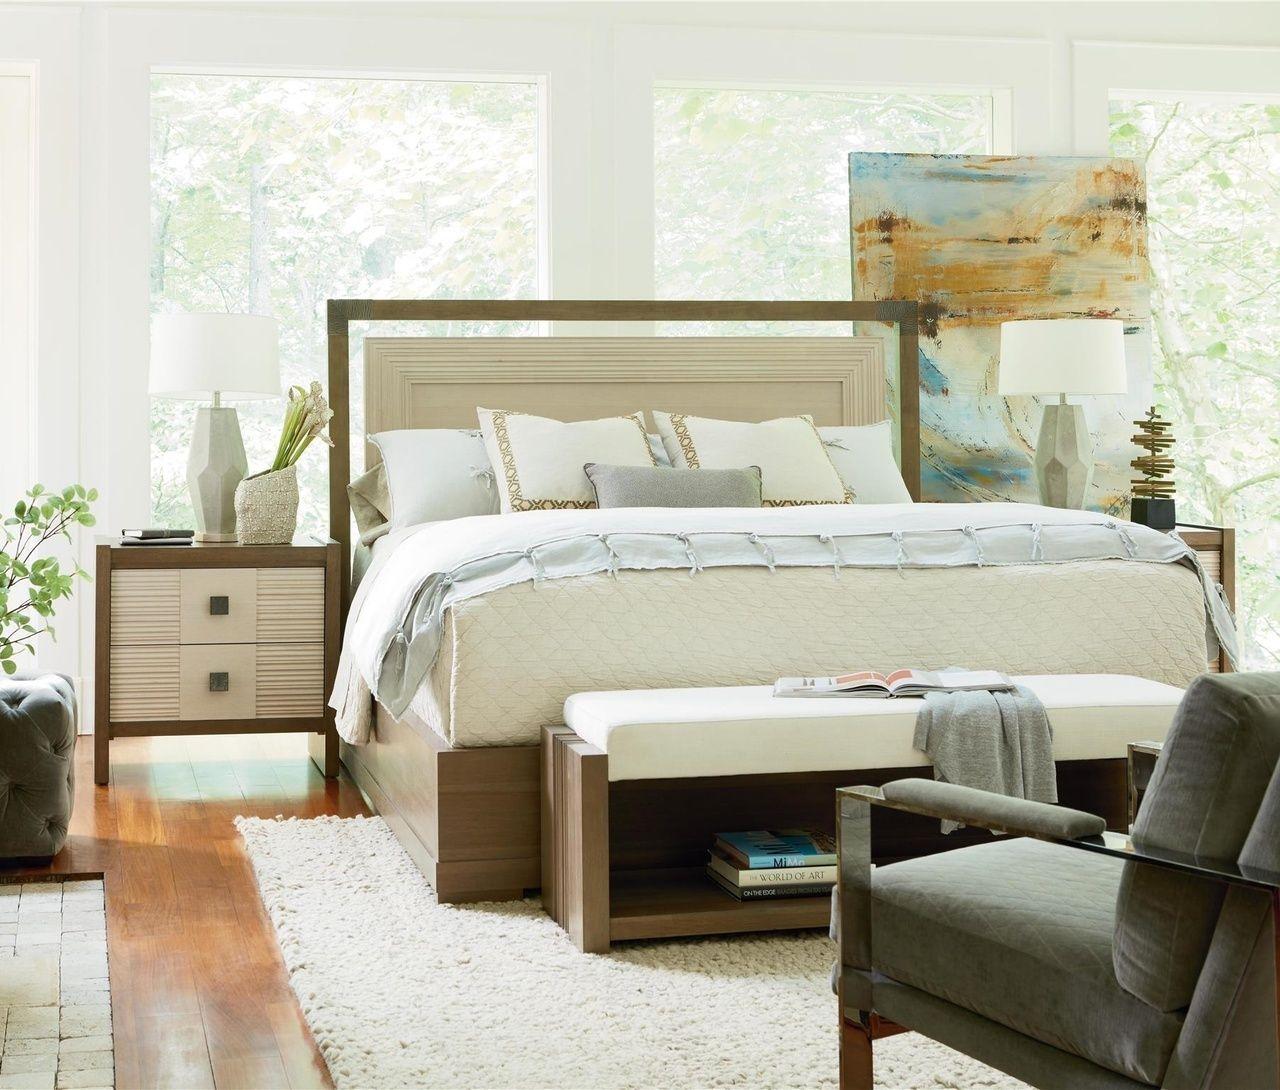 City MidCentury Modern Queen Bed Universal furniture